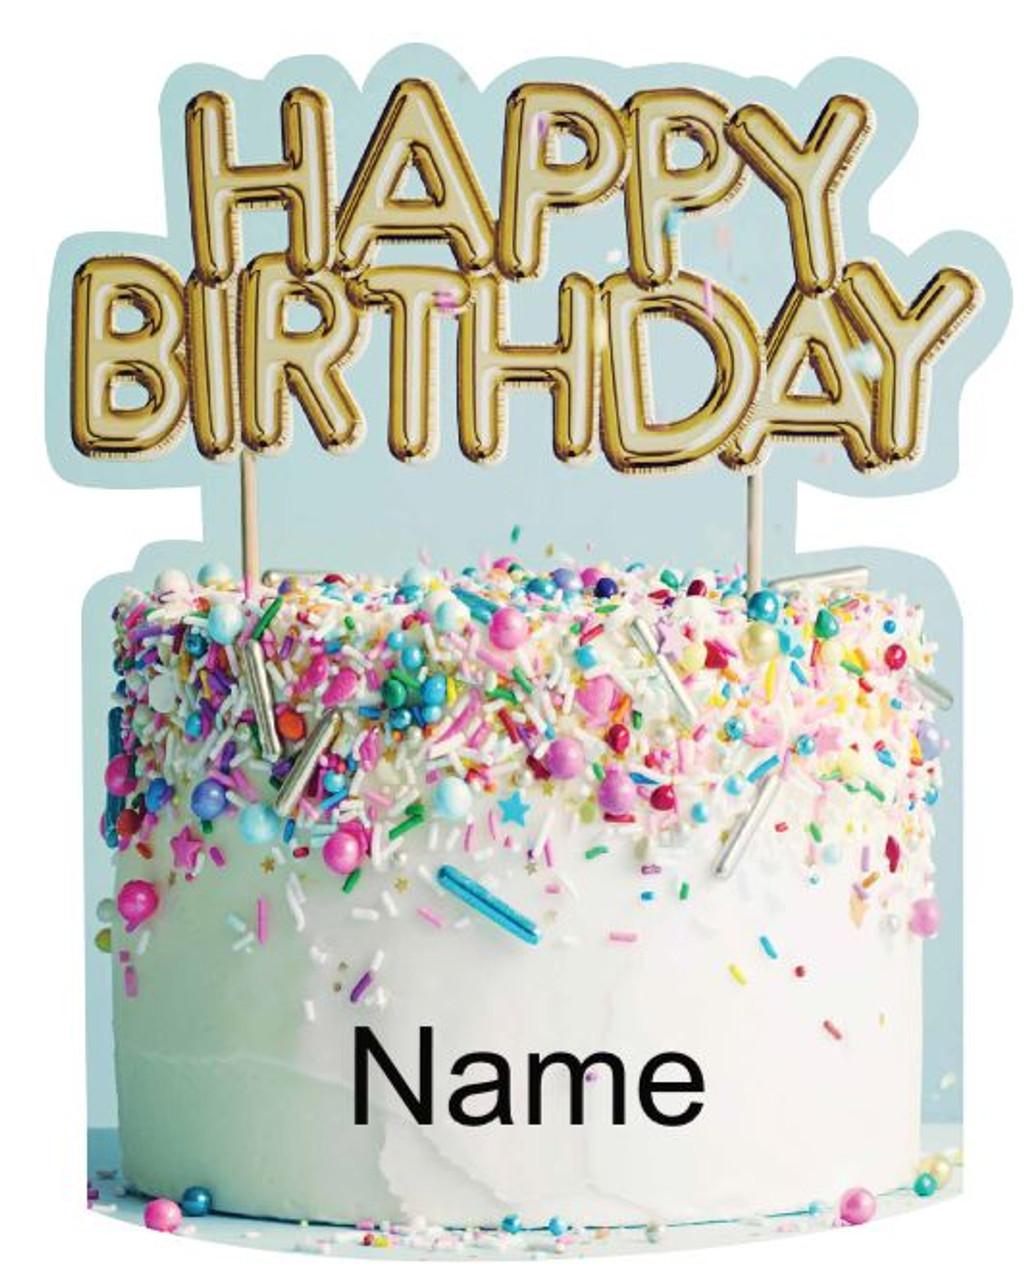 Add Your Name - Happy Birthday Cake Yard Sign